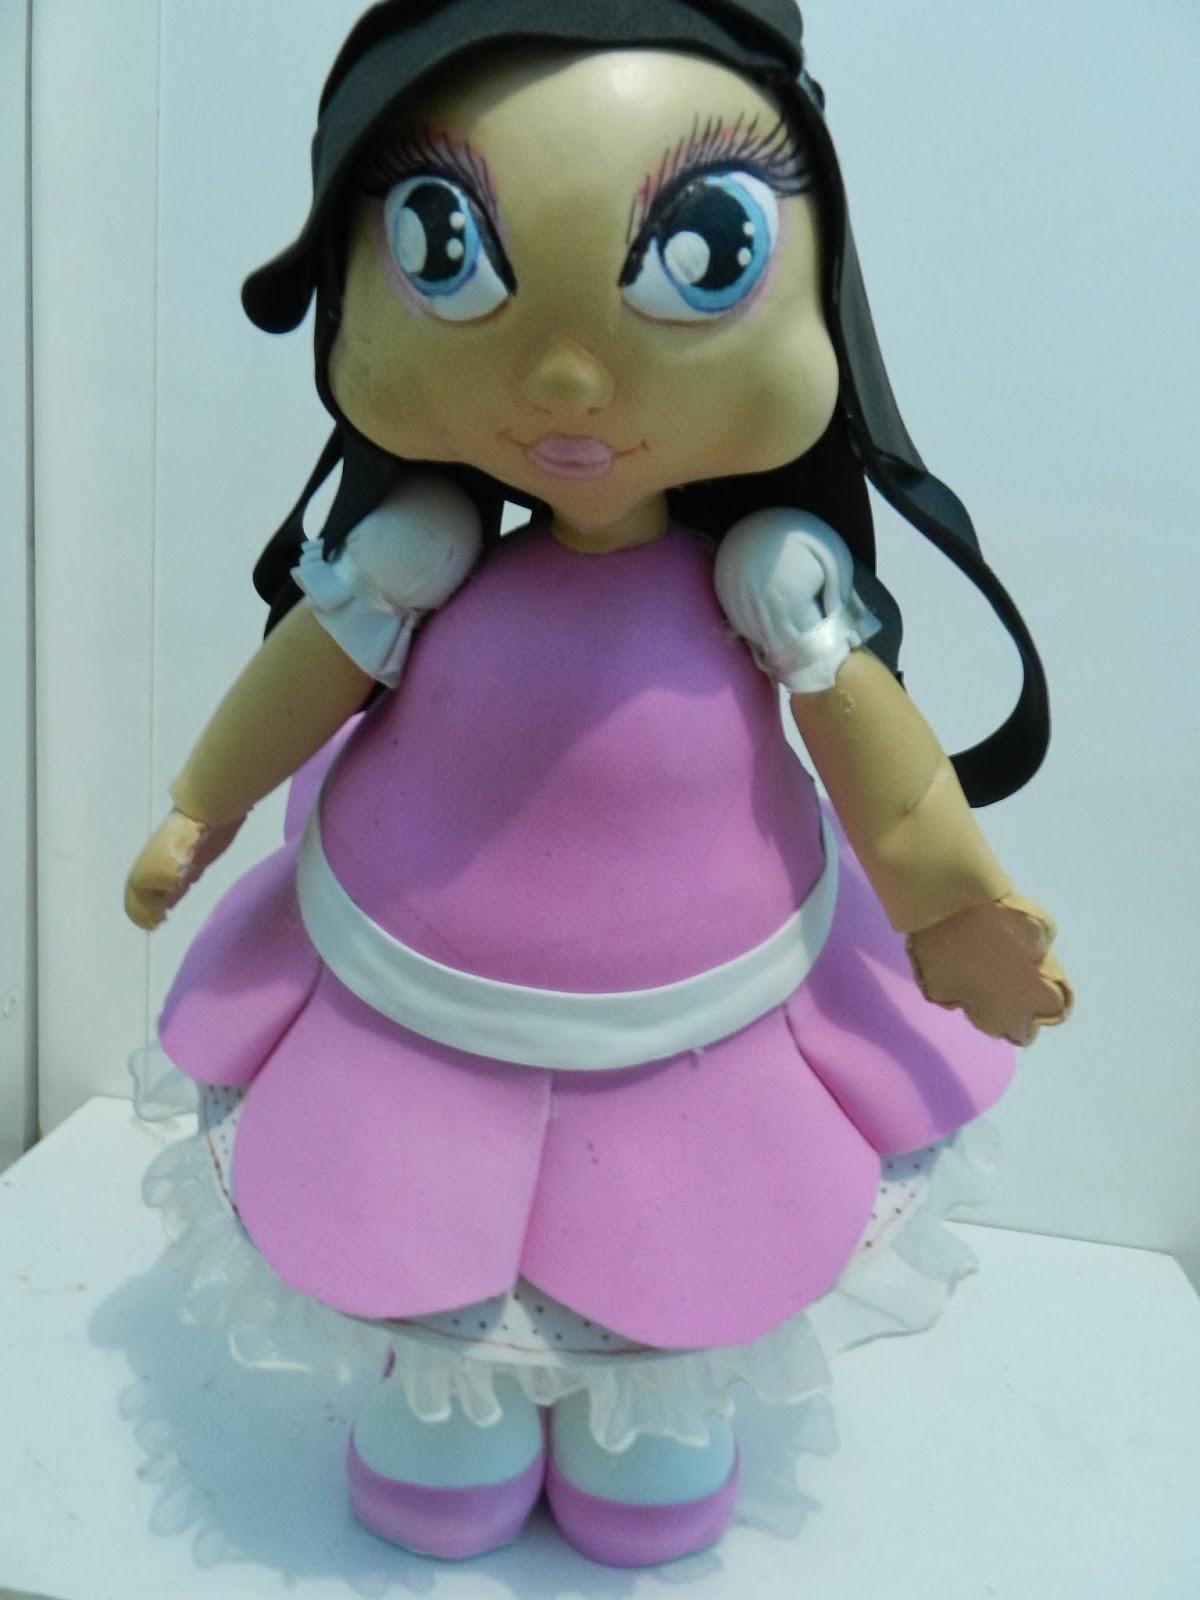 Boneca 3D de EVA inspirada na Jolie